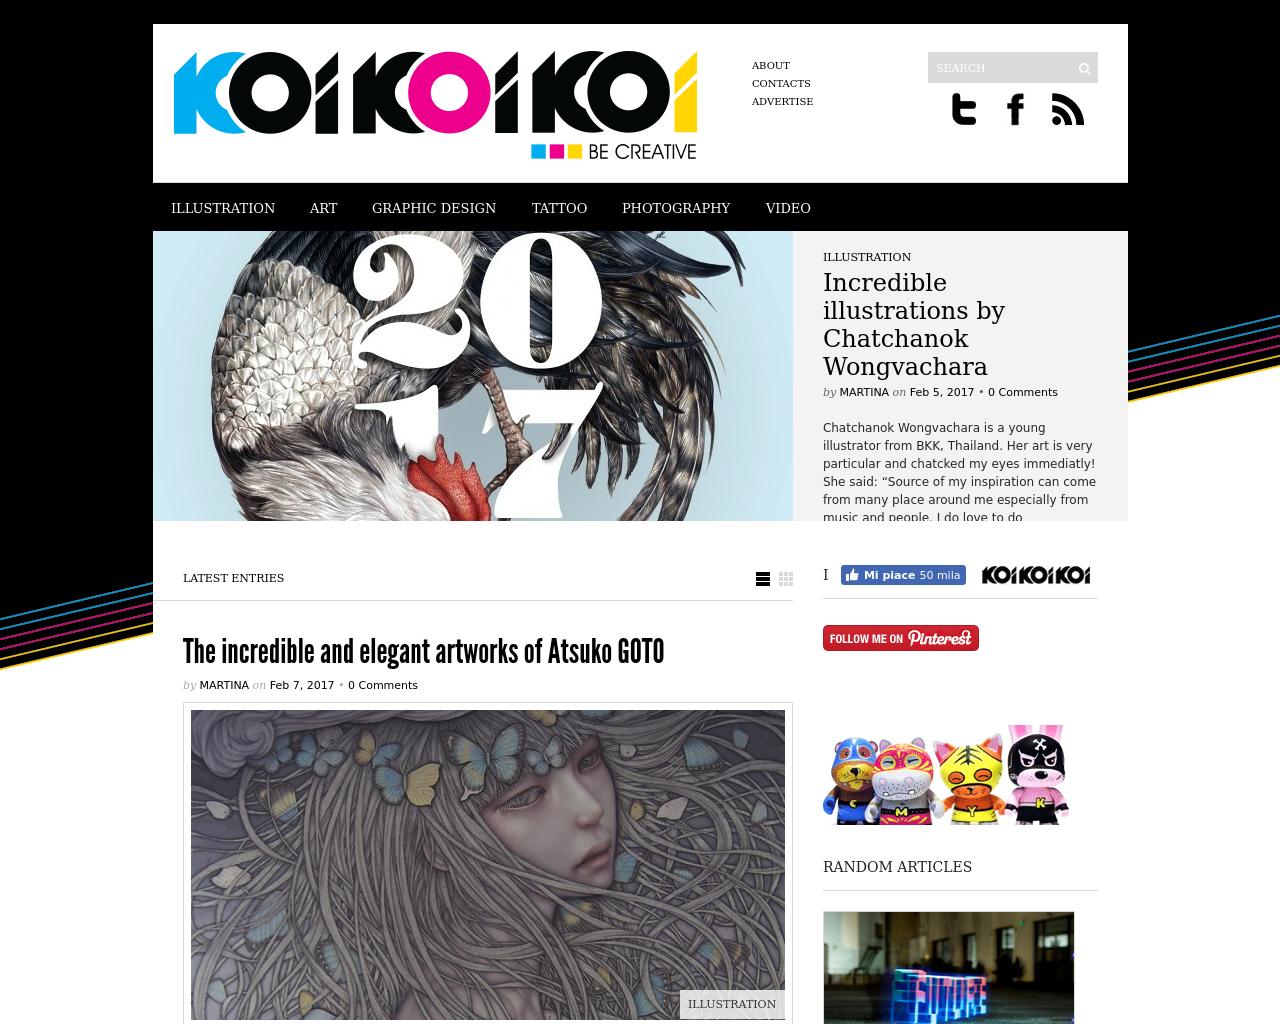 KoiKoiKoi-Advertising-Reviews-Pricing